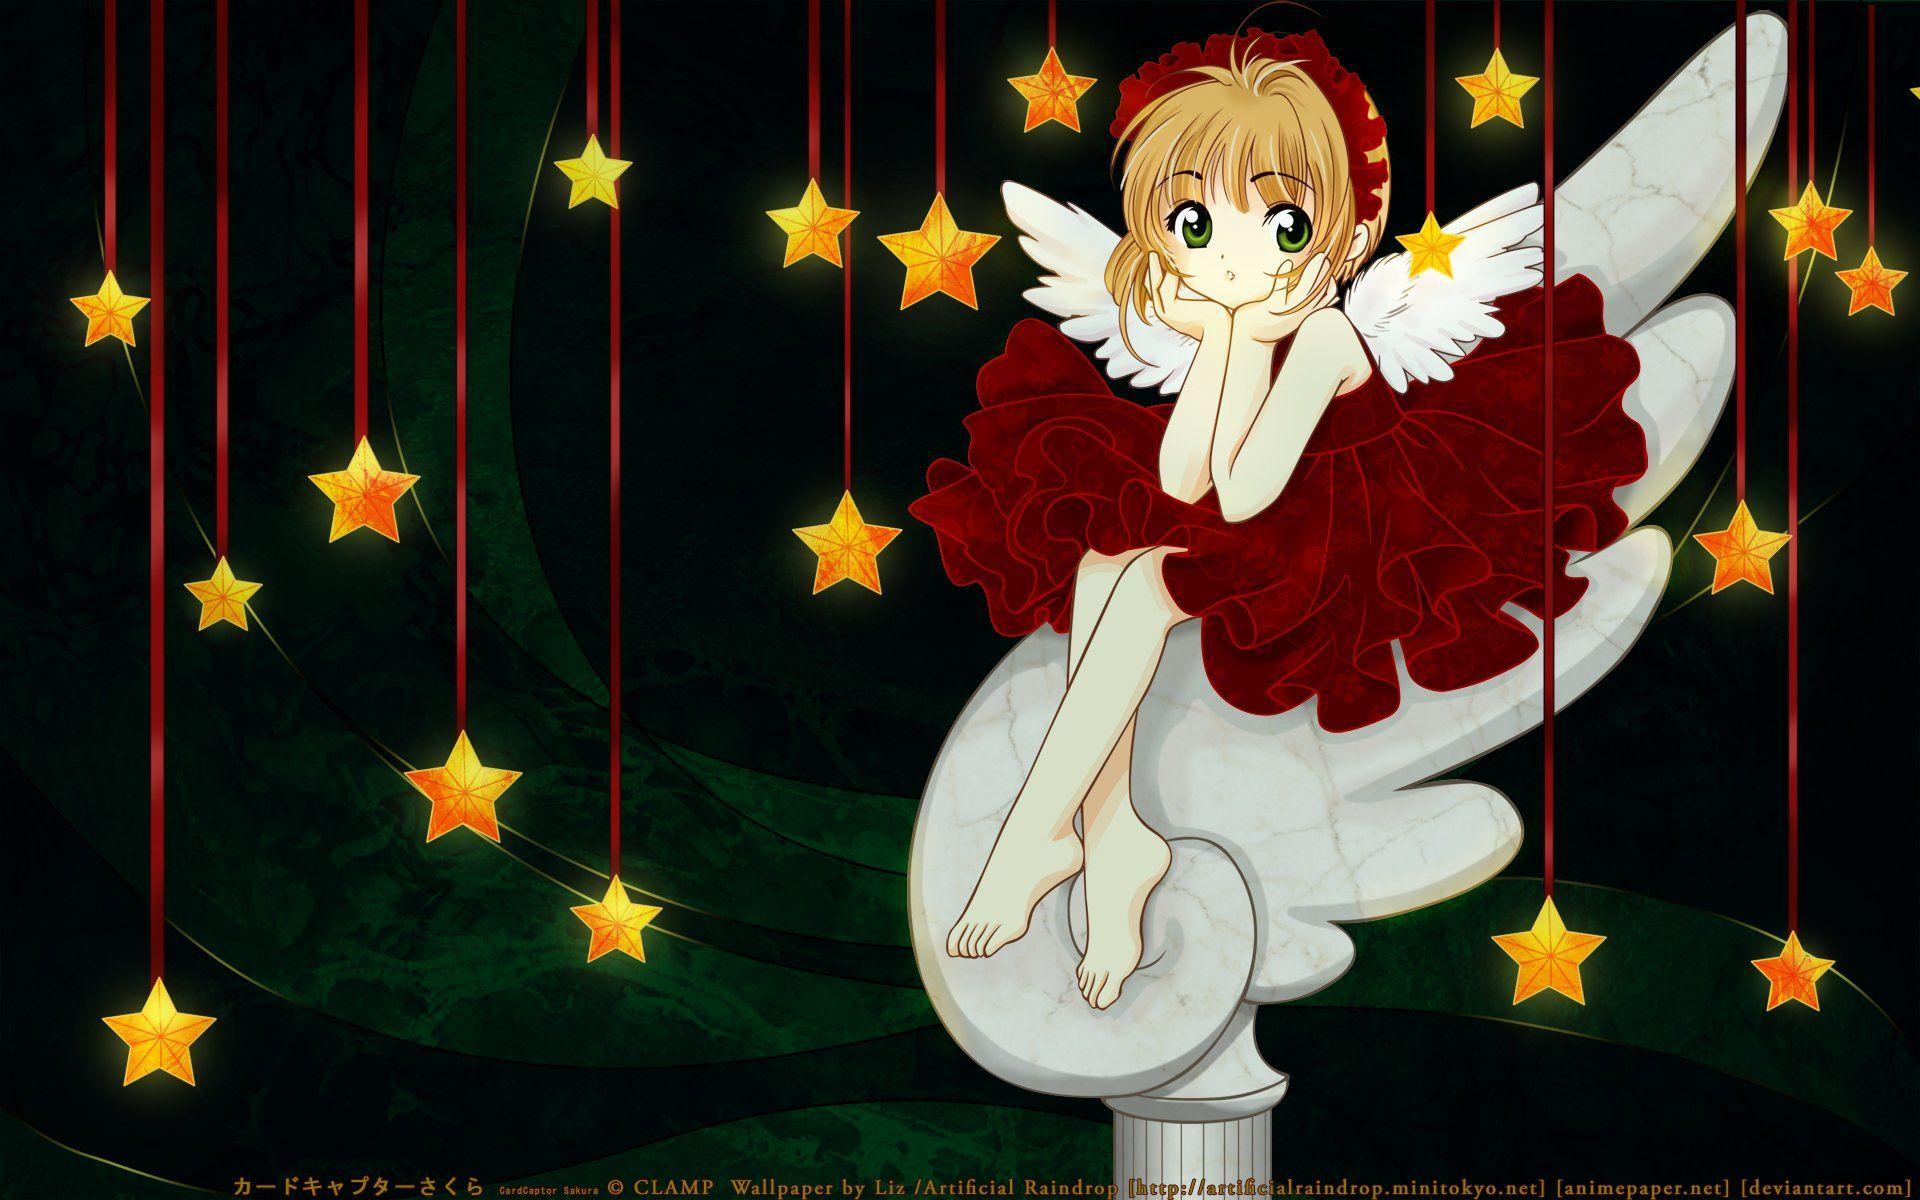 Cardcaptor Sakura Wallpapers Desktop Background For Free Wallpaper Cardcaptor Sakura Anime Sakura